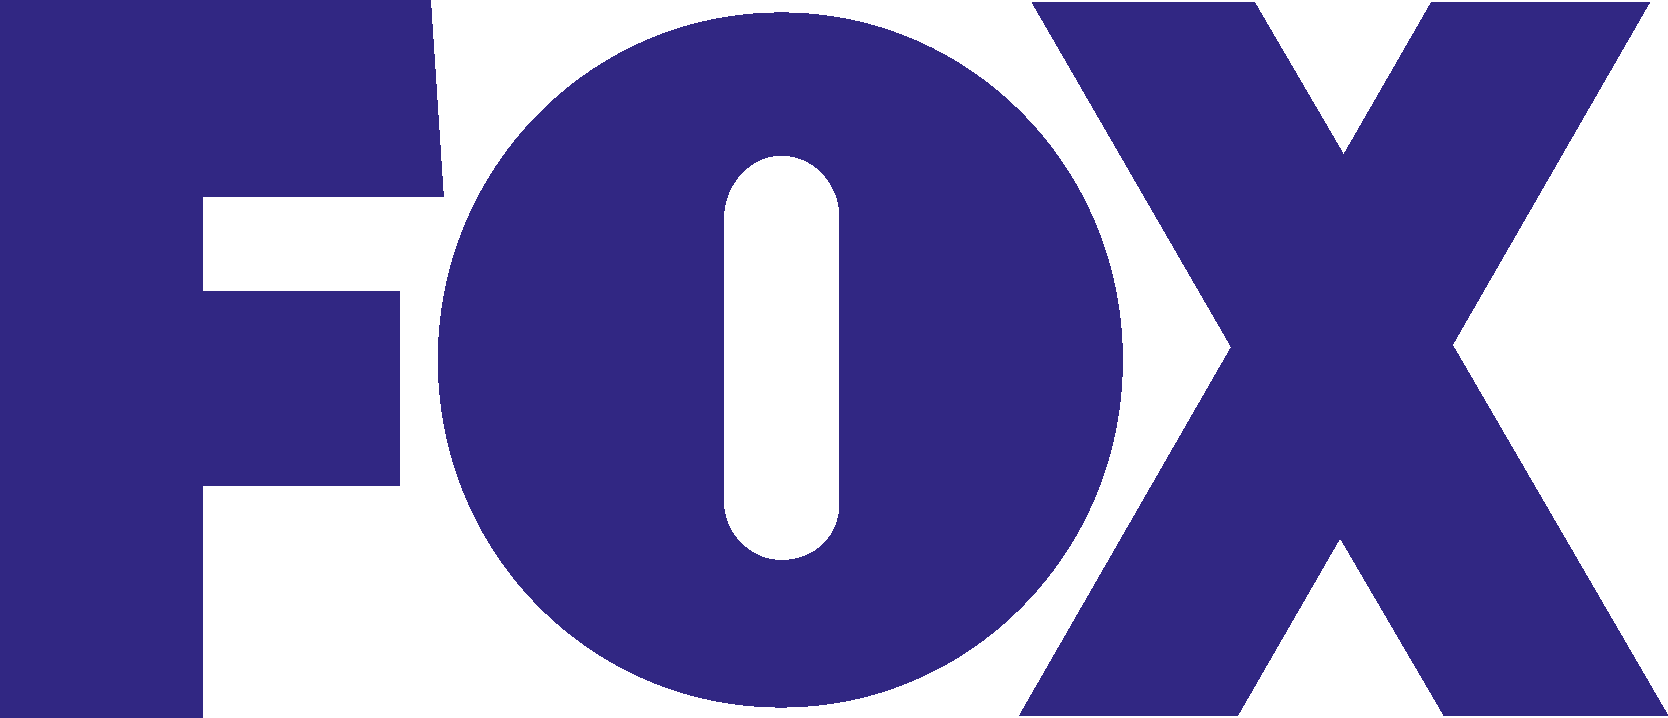 Fox Tv Logo Free Vector Download.